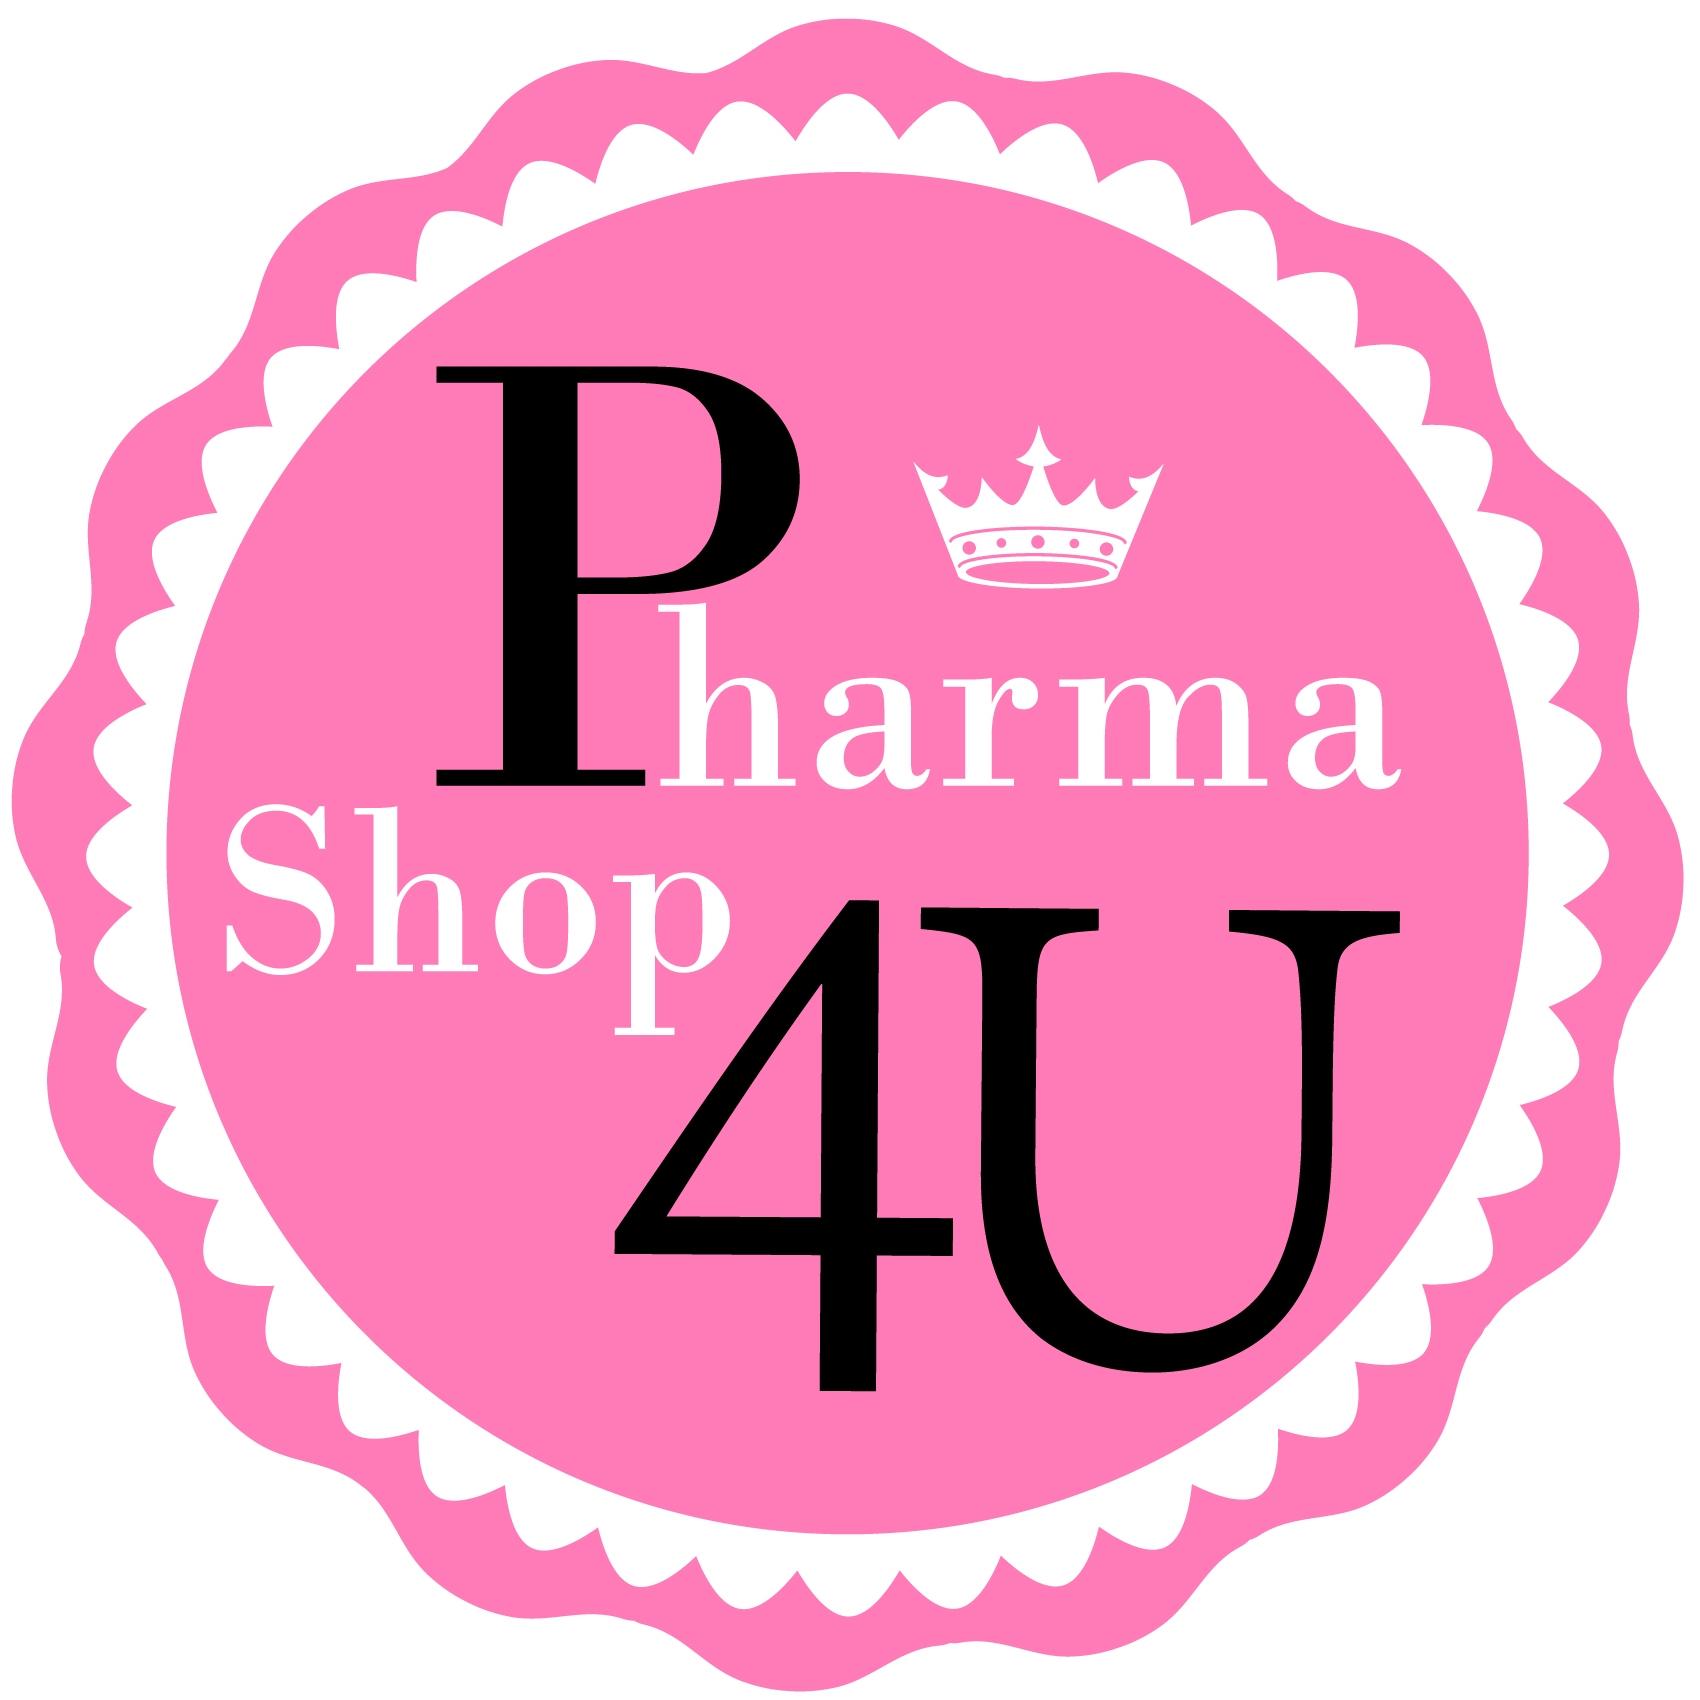 PharmaShop4U